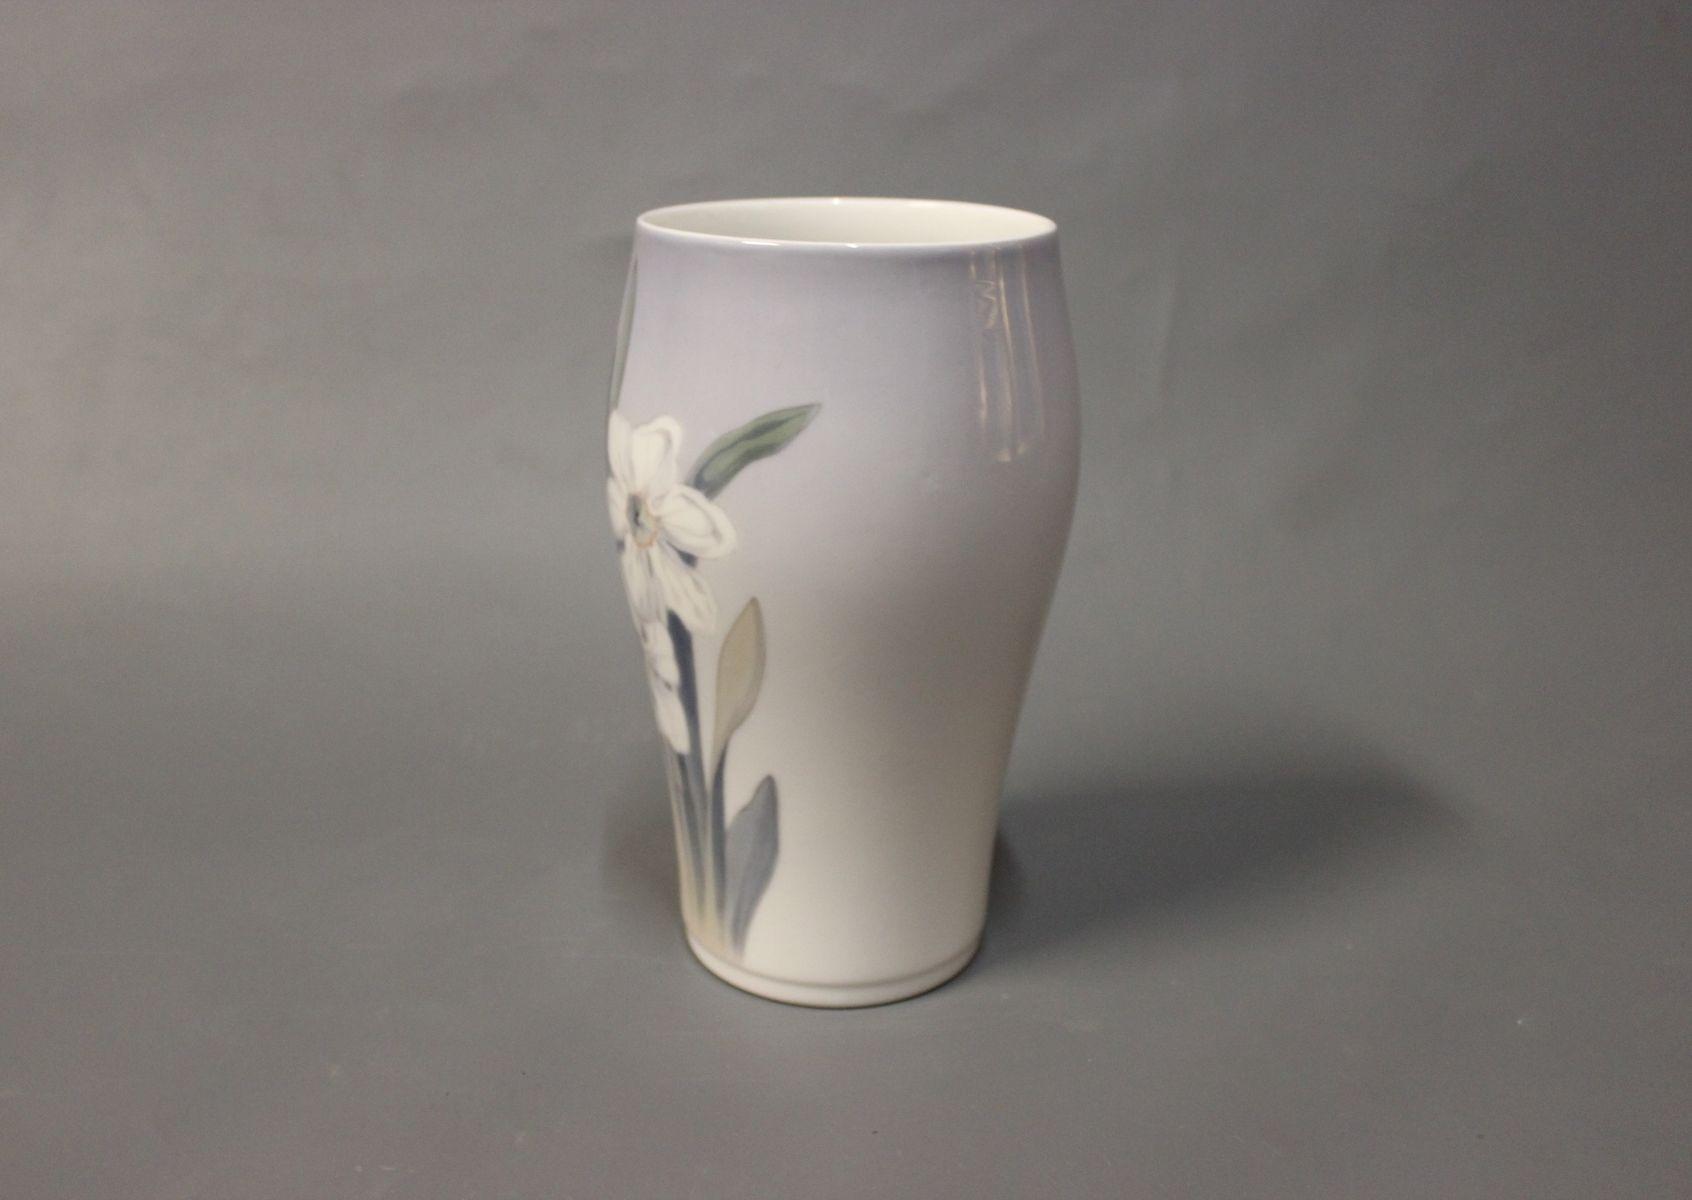 Danish floral motif vase from royal copenhagen 1957 for sale at danish floral motif vase from royal copenhagen 1957 reviewsmspy